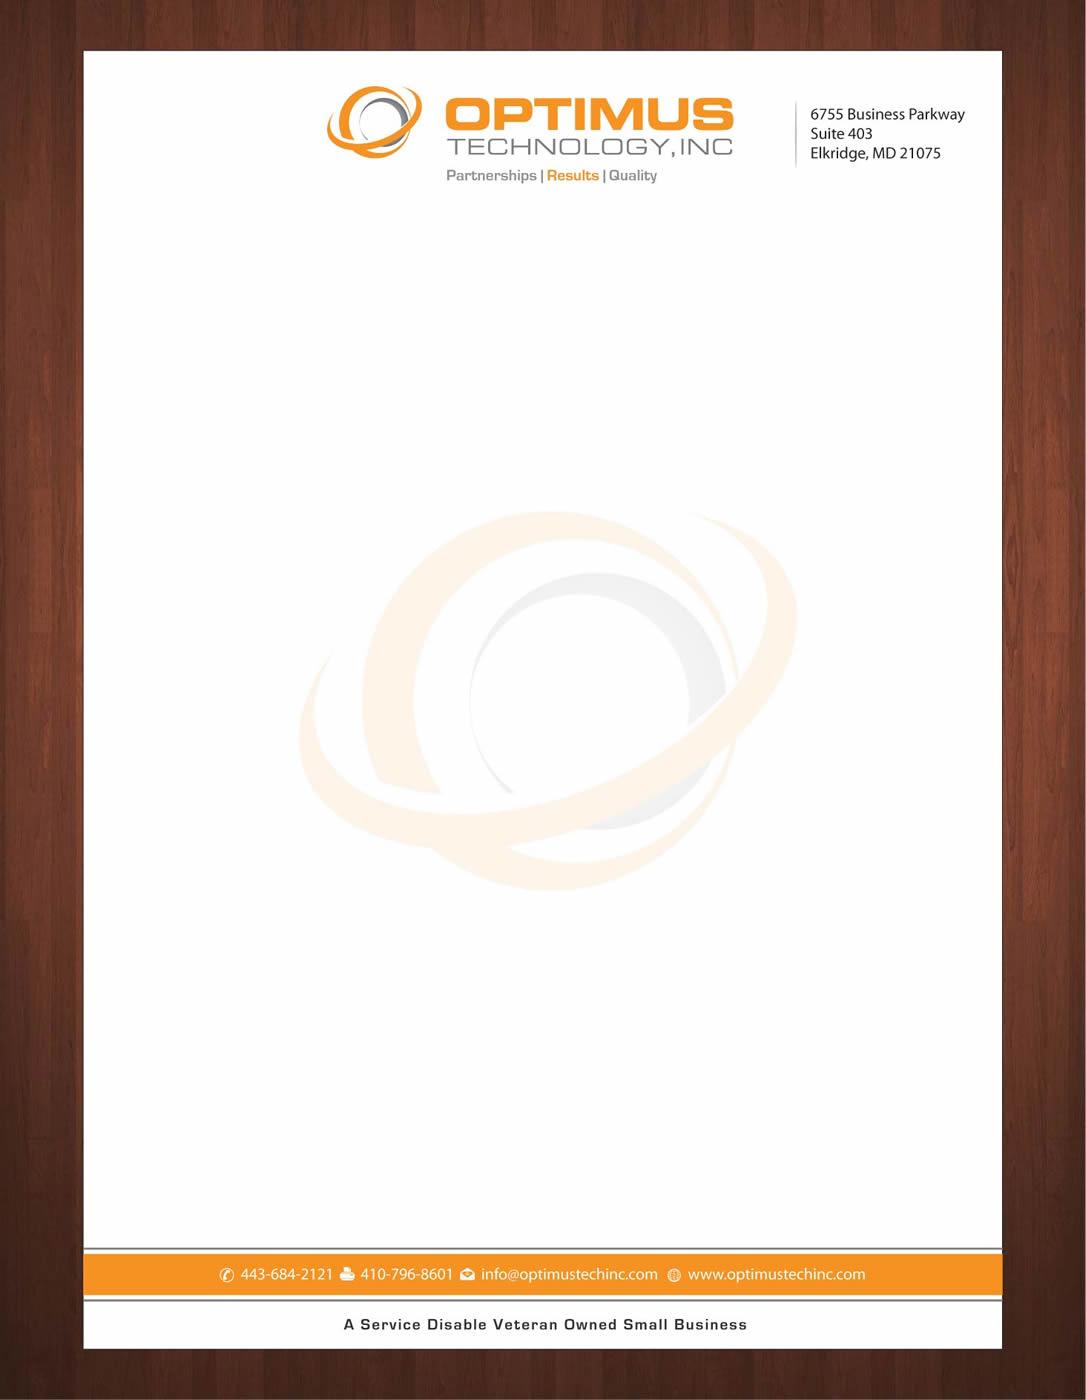 Serious Professional Letterhead Design for Optimus Technology – Corporate Letterhead